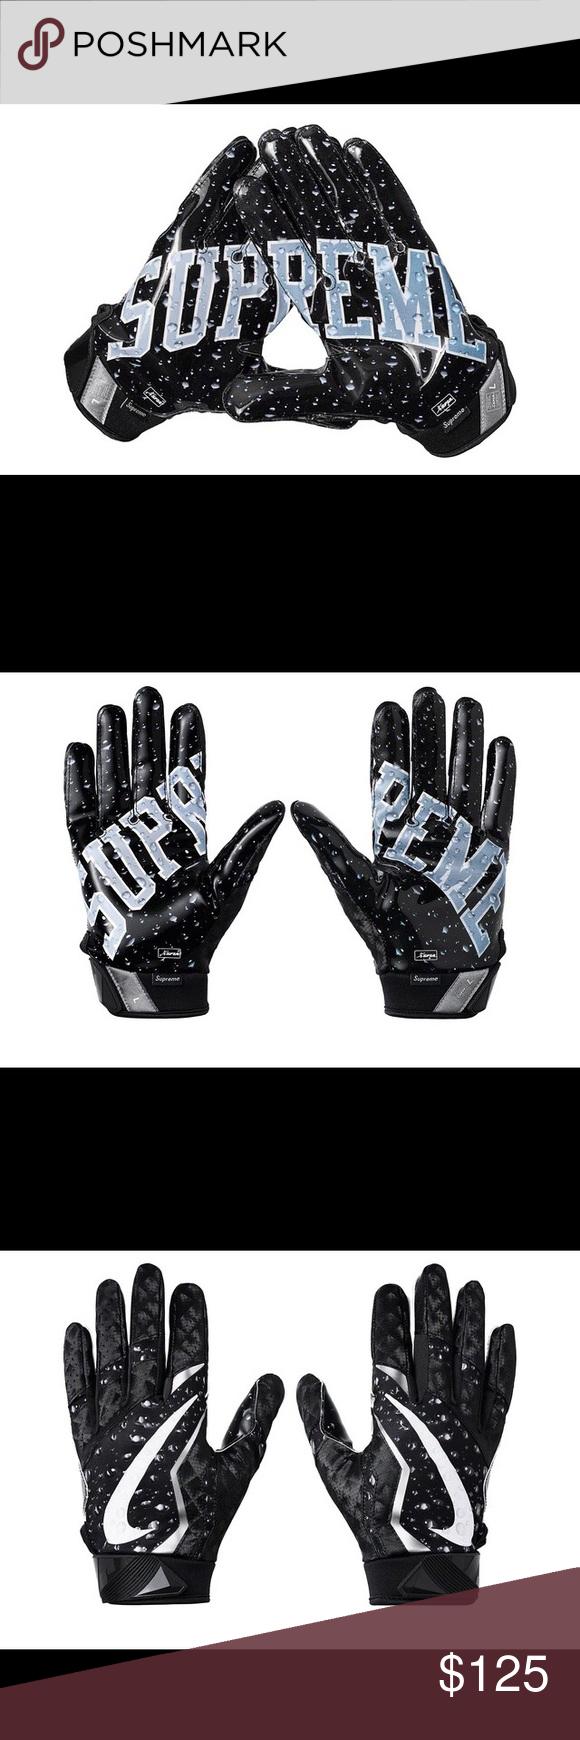 Supreme Nike Vapor Jet 4 0 Football Gloves Black Nike Vapor Football Gloves Things To Sell